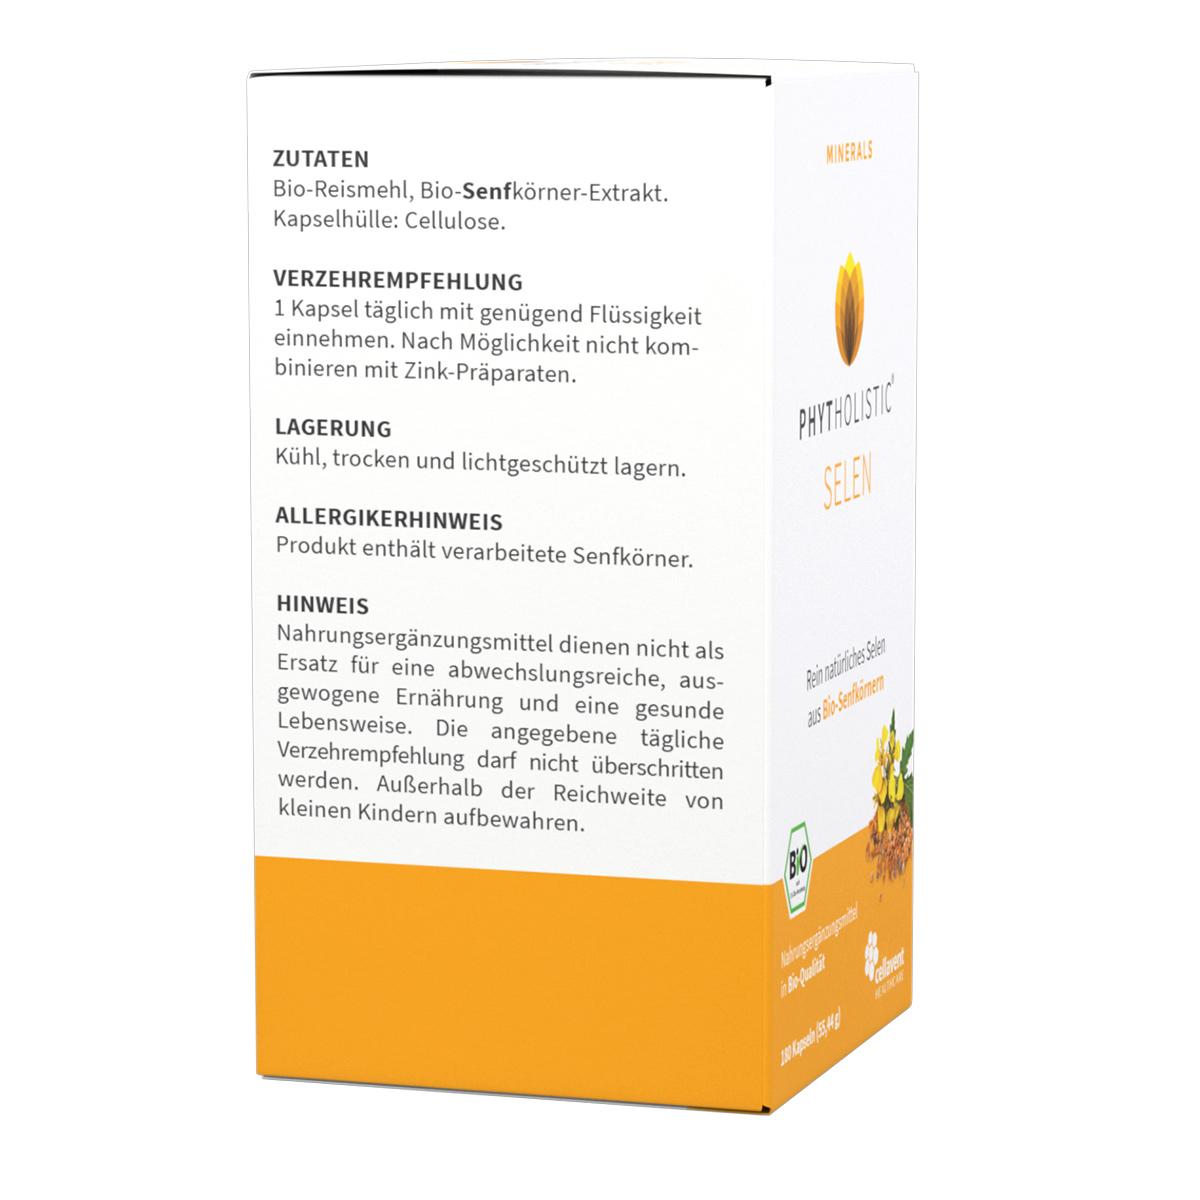 selen-kapseln-bio-rein-pflanzlich-phytholistic-180-stueck-verpackung-links-1200x1200